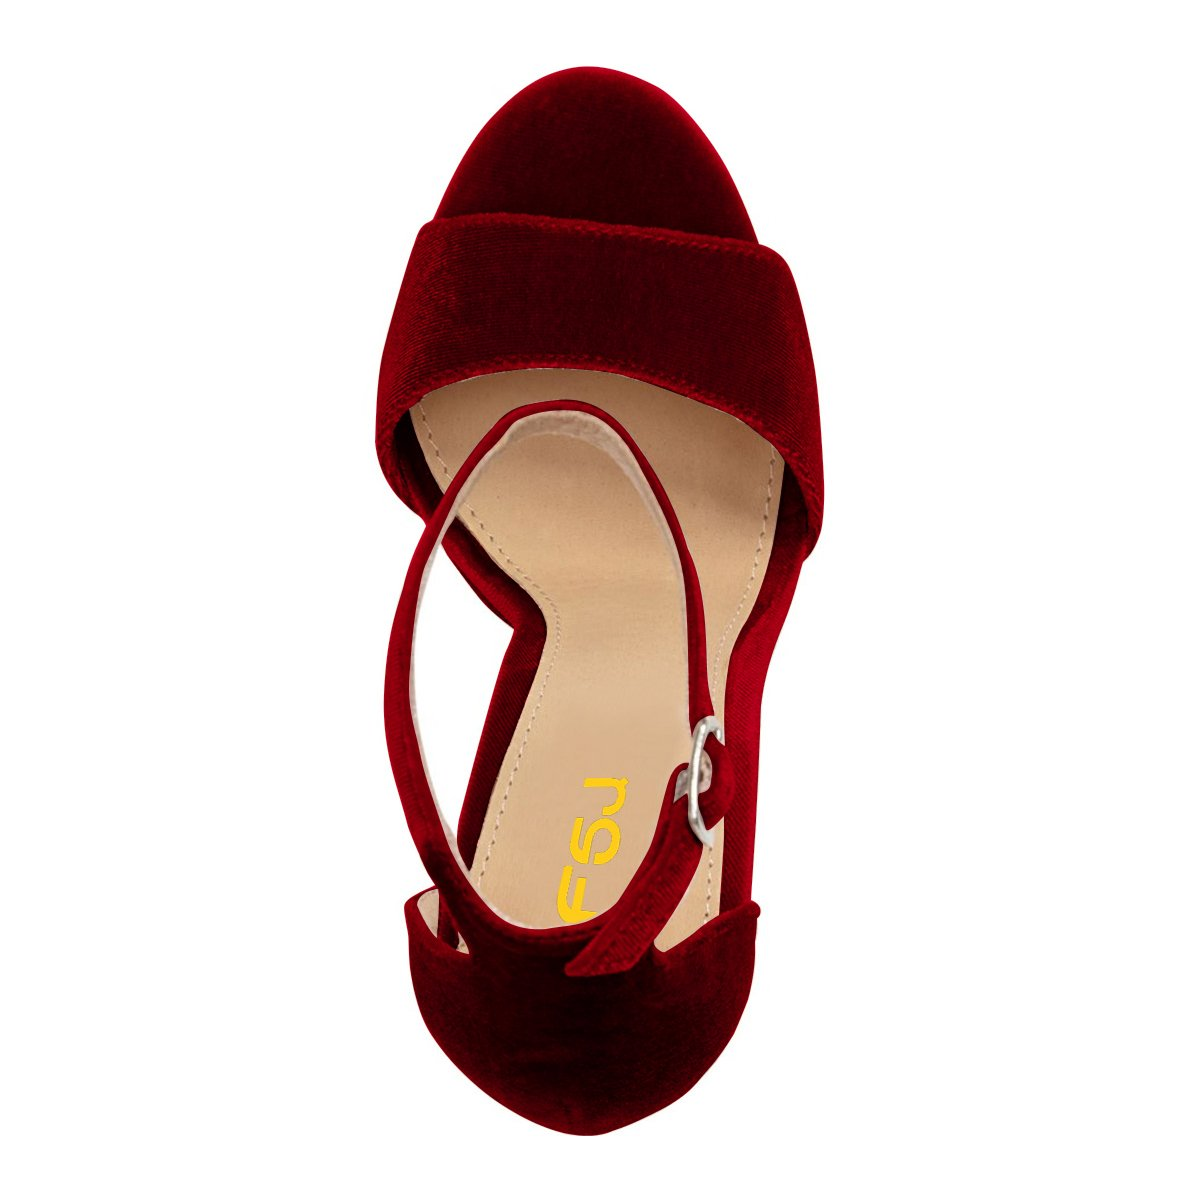 FSJ Women Sexy Ankle Strap Platform Sandals Chunky High Heel Open Toe Velvet Shoes Size 4-15 US B0796MLN1H 11 B(M) US|Wine